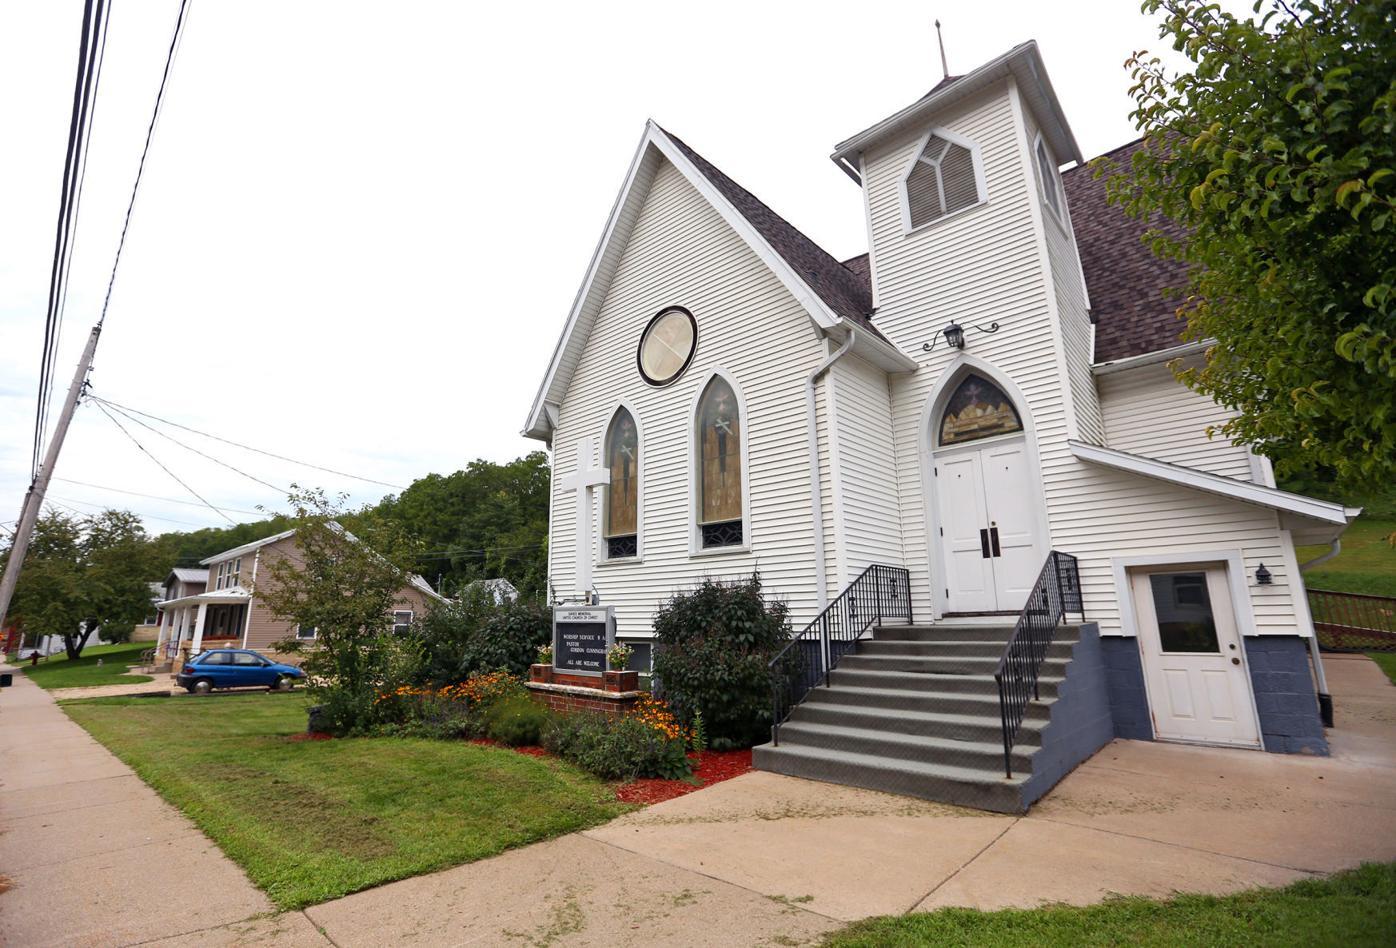 Davies Memorial United Church of Christ